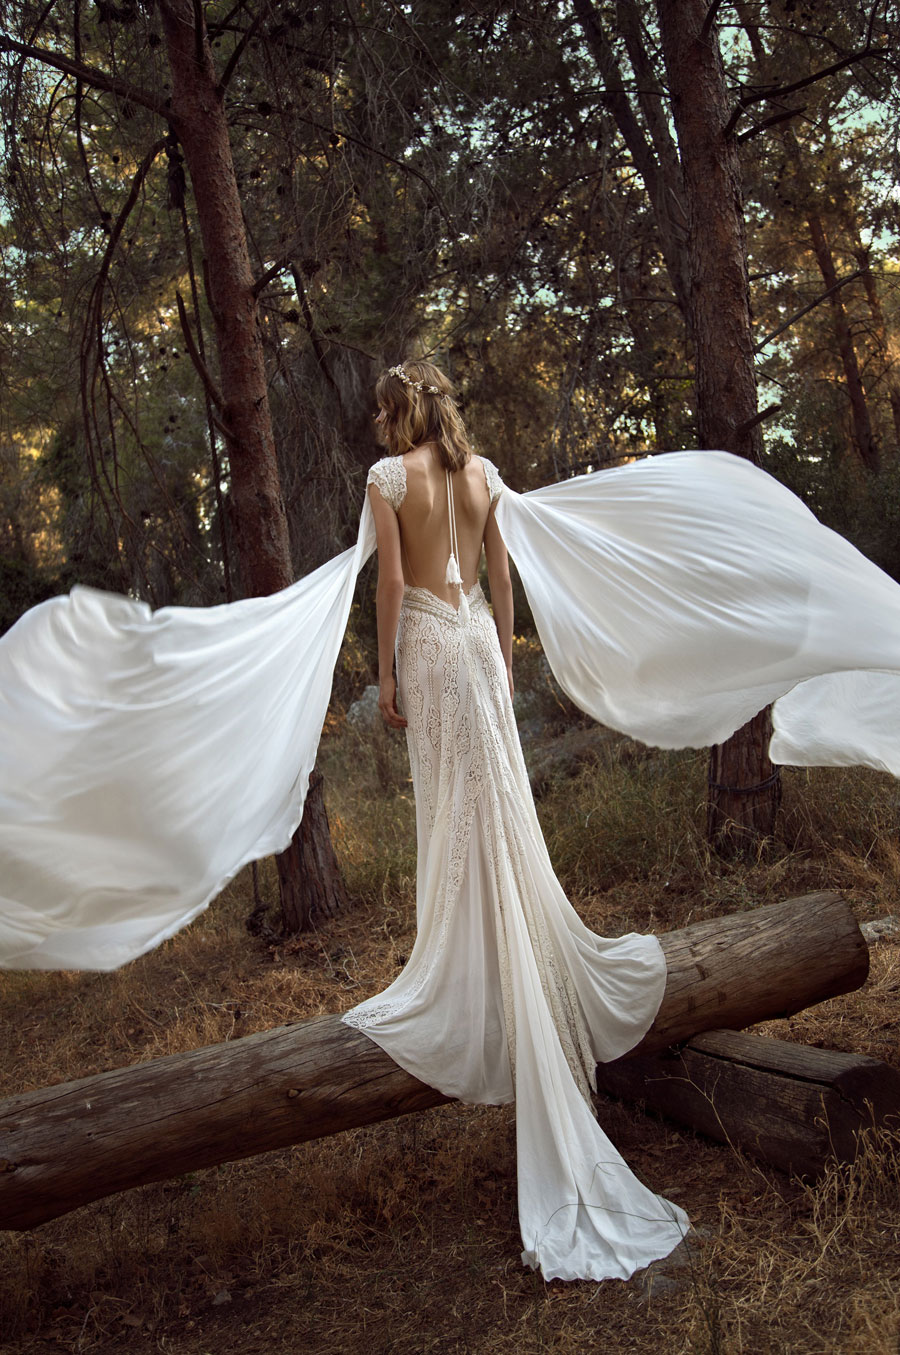 Wedding Dresses for the Urban-Boho Bride- Gala Collection No. IV0018